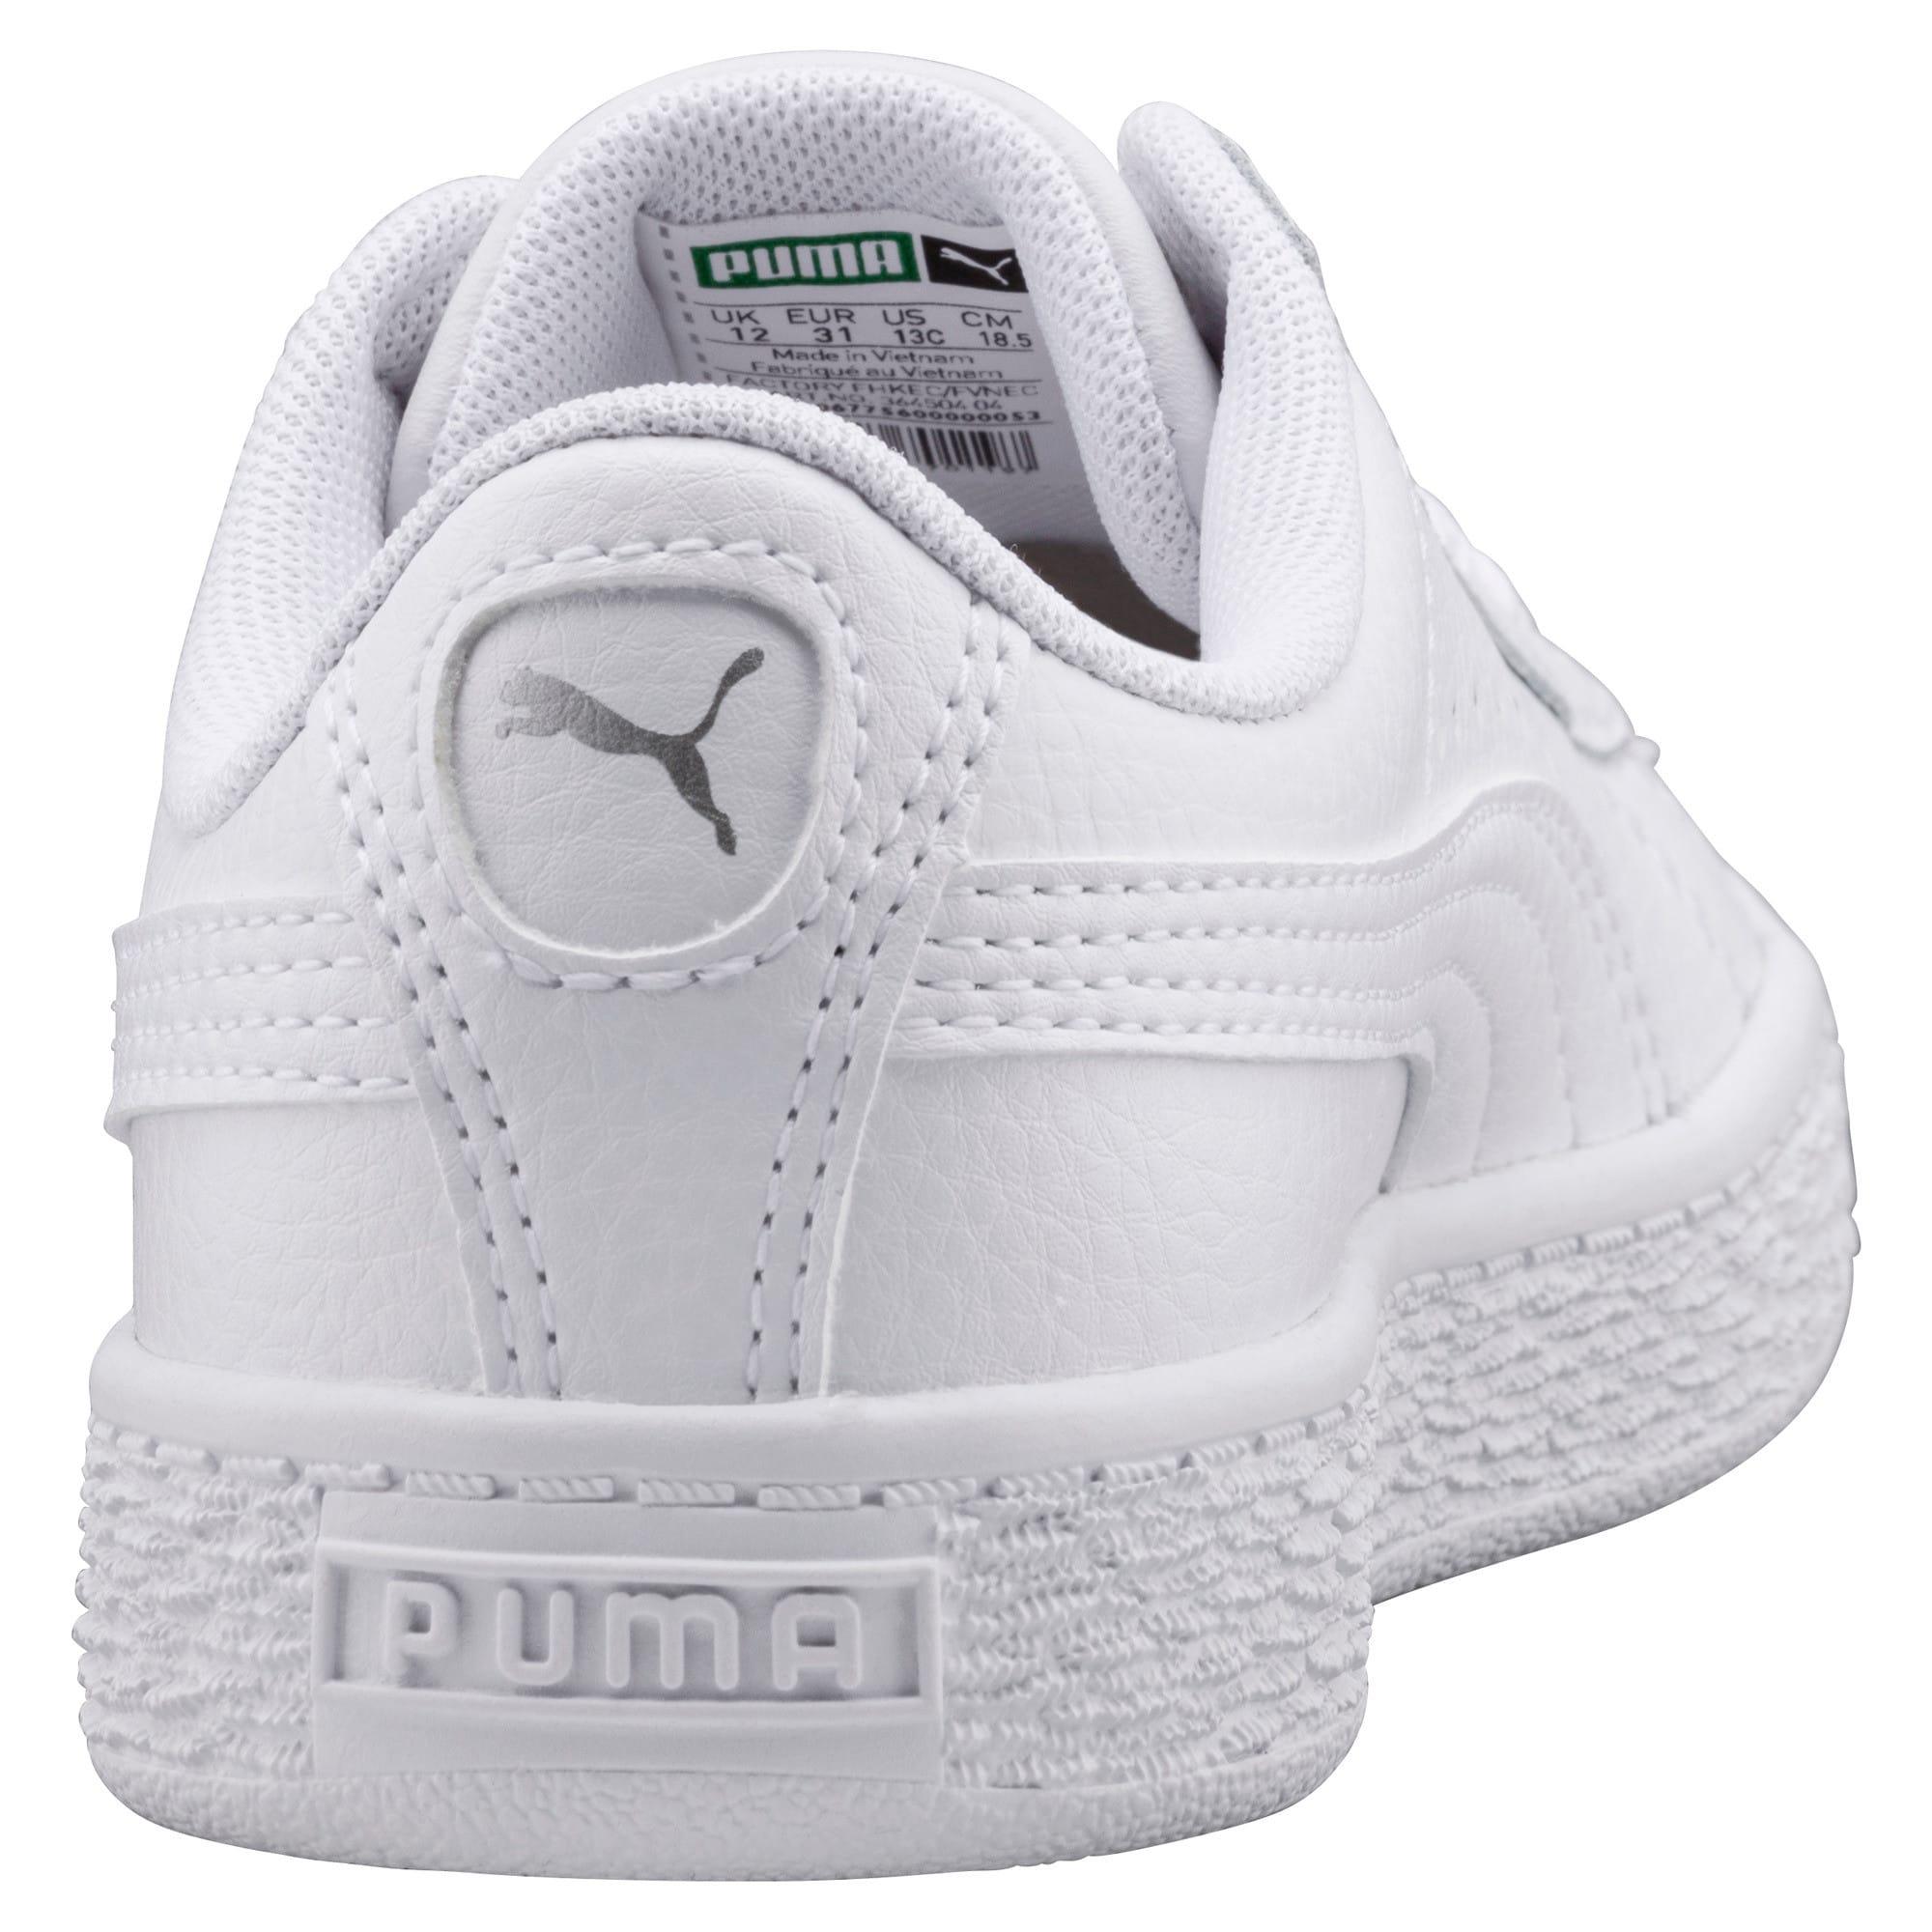 Thumbnail 3 of Basket Classic Little Kids' Shoes, Puma White-Puma White, medium